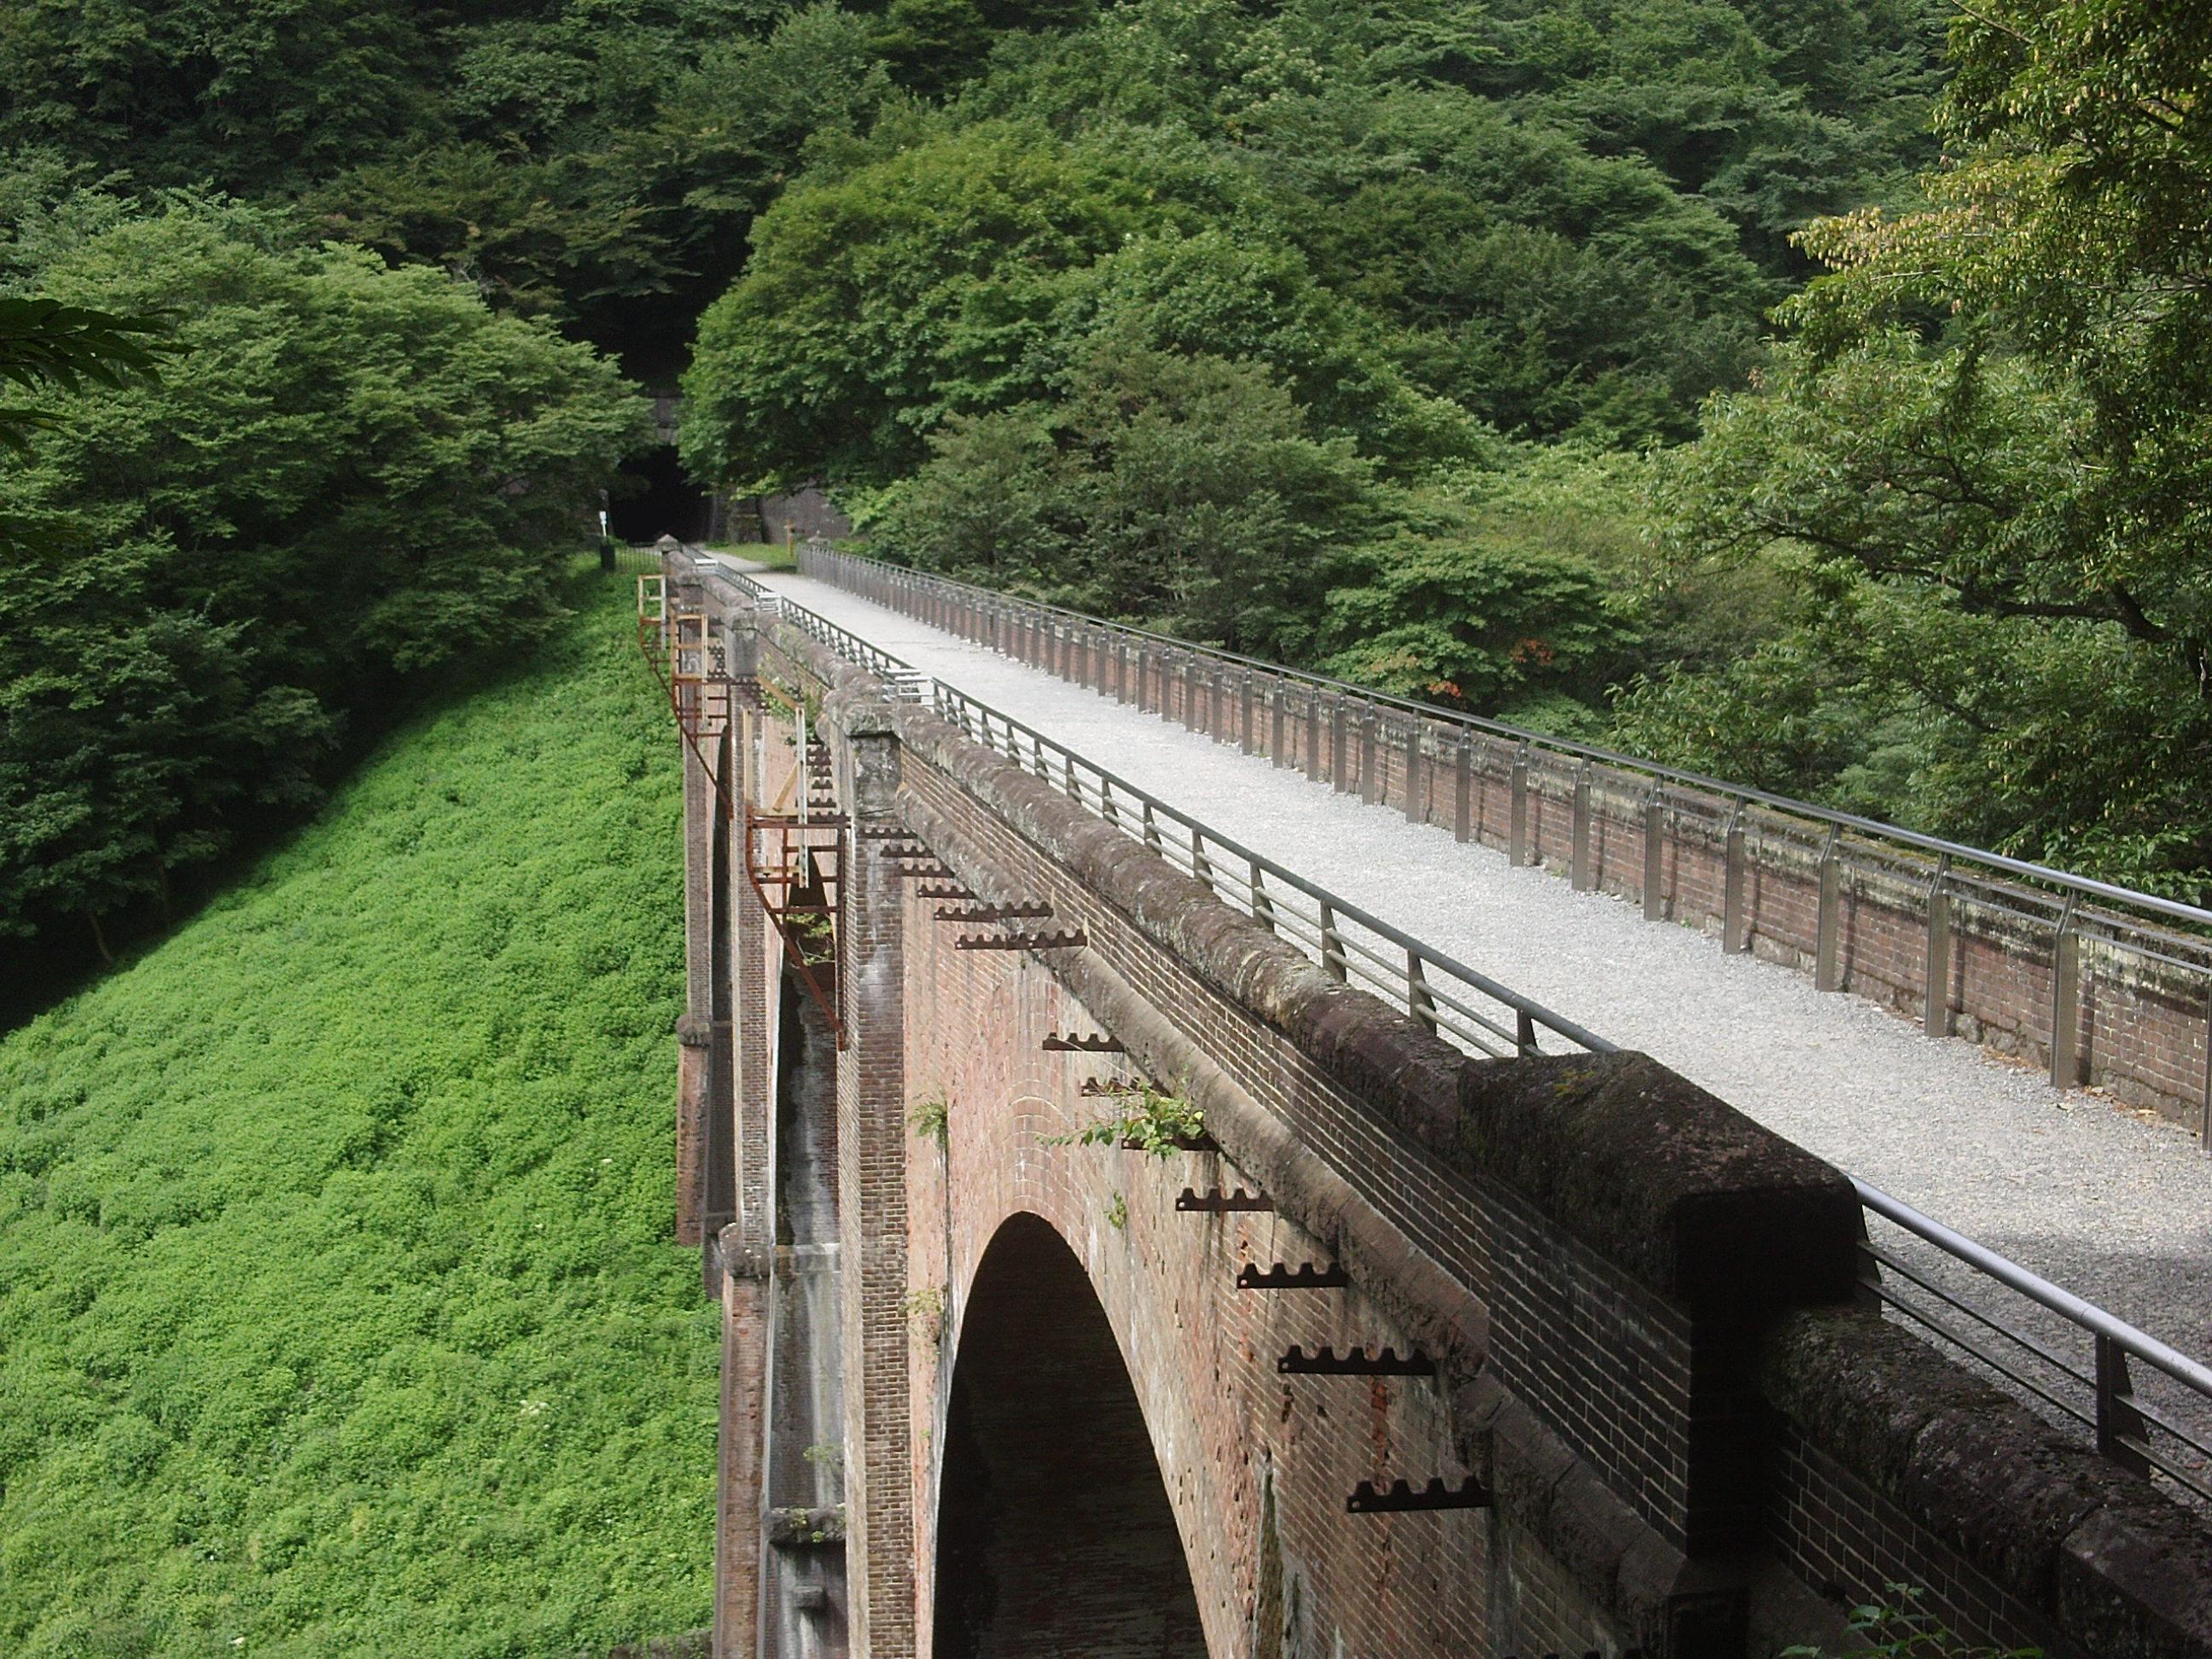 https://upload.wikimedia.org/wikipedia/commons/a/a1/Abt_road_on_Usui_3rd_Bridge.JPG